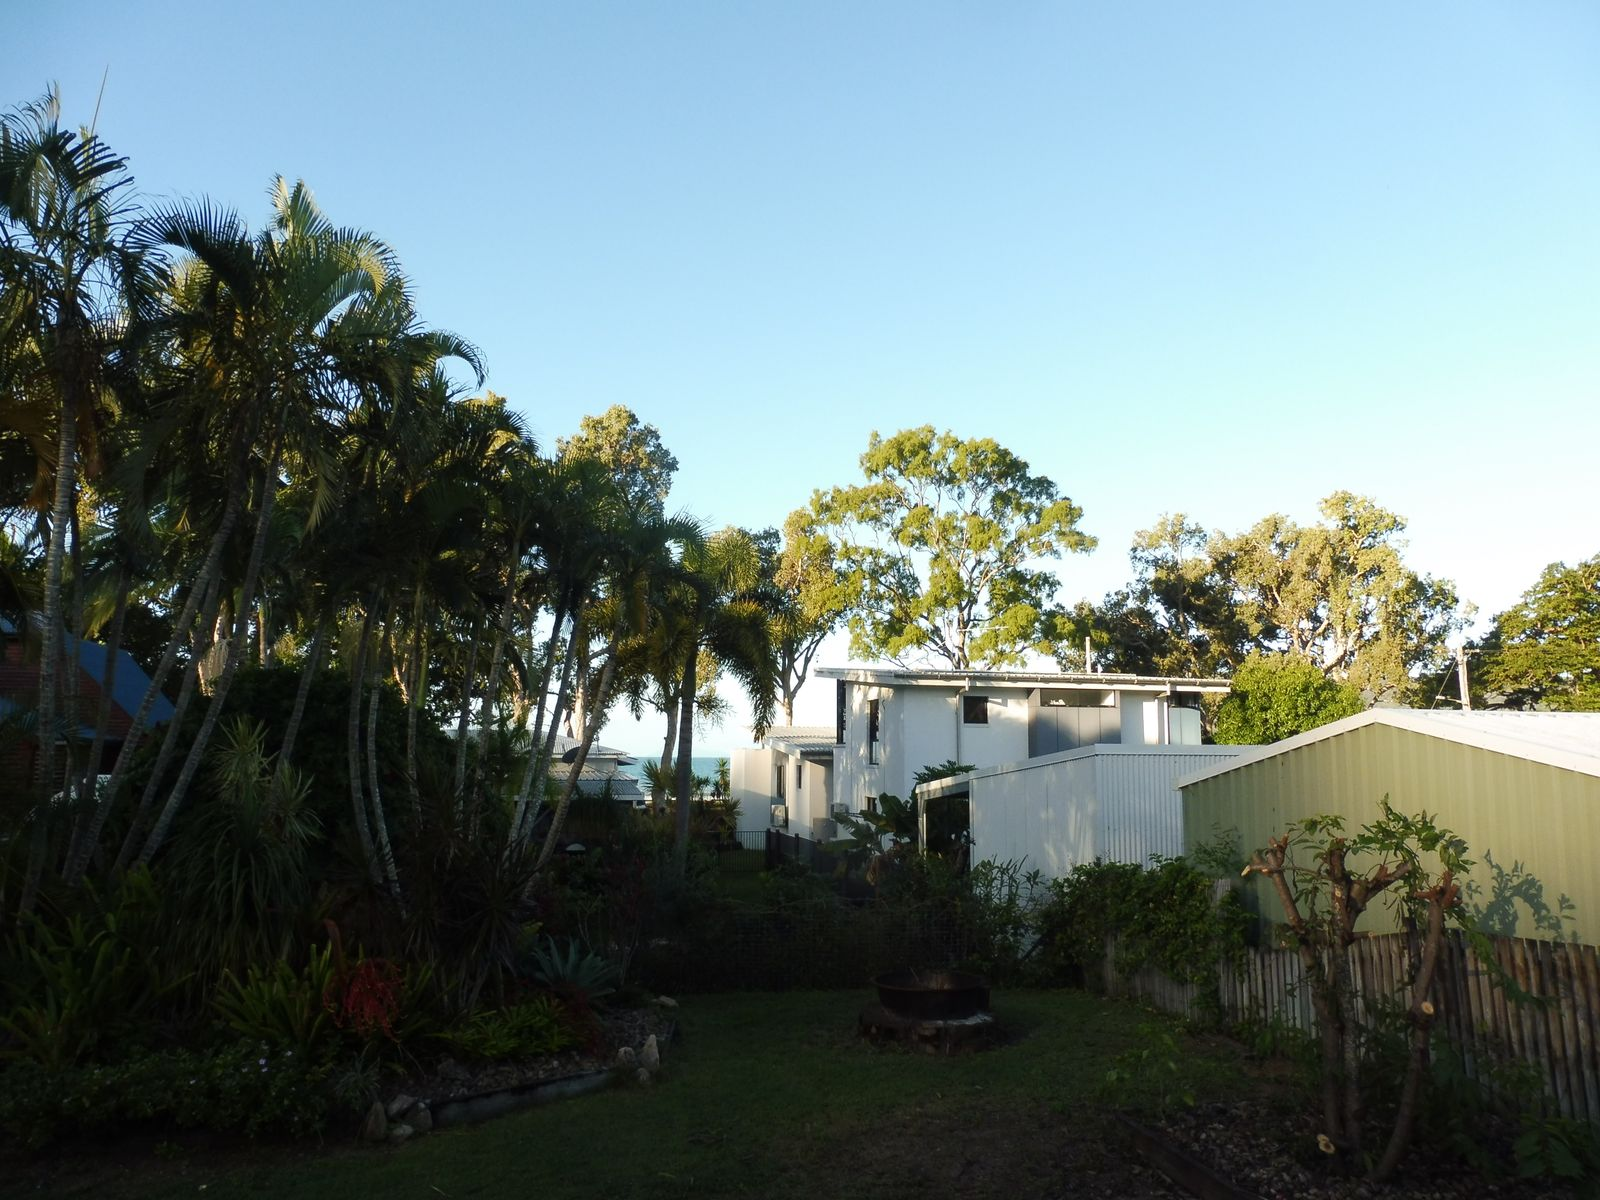 9 Oliver Street, Ball Bay, QLD 4741